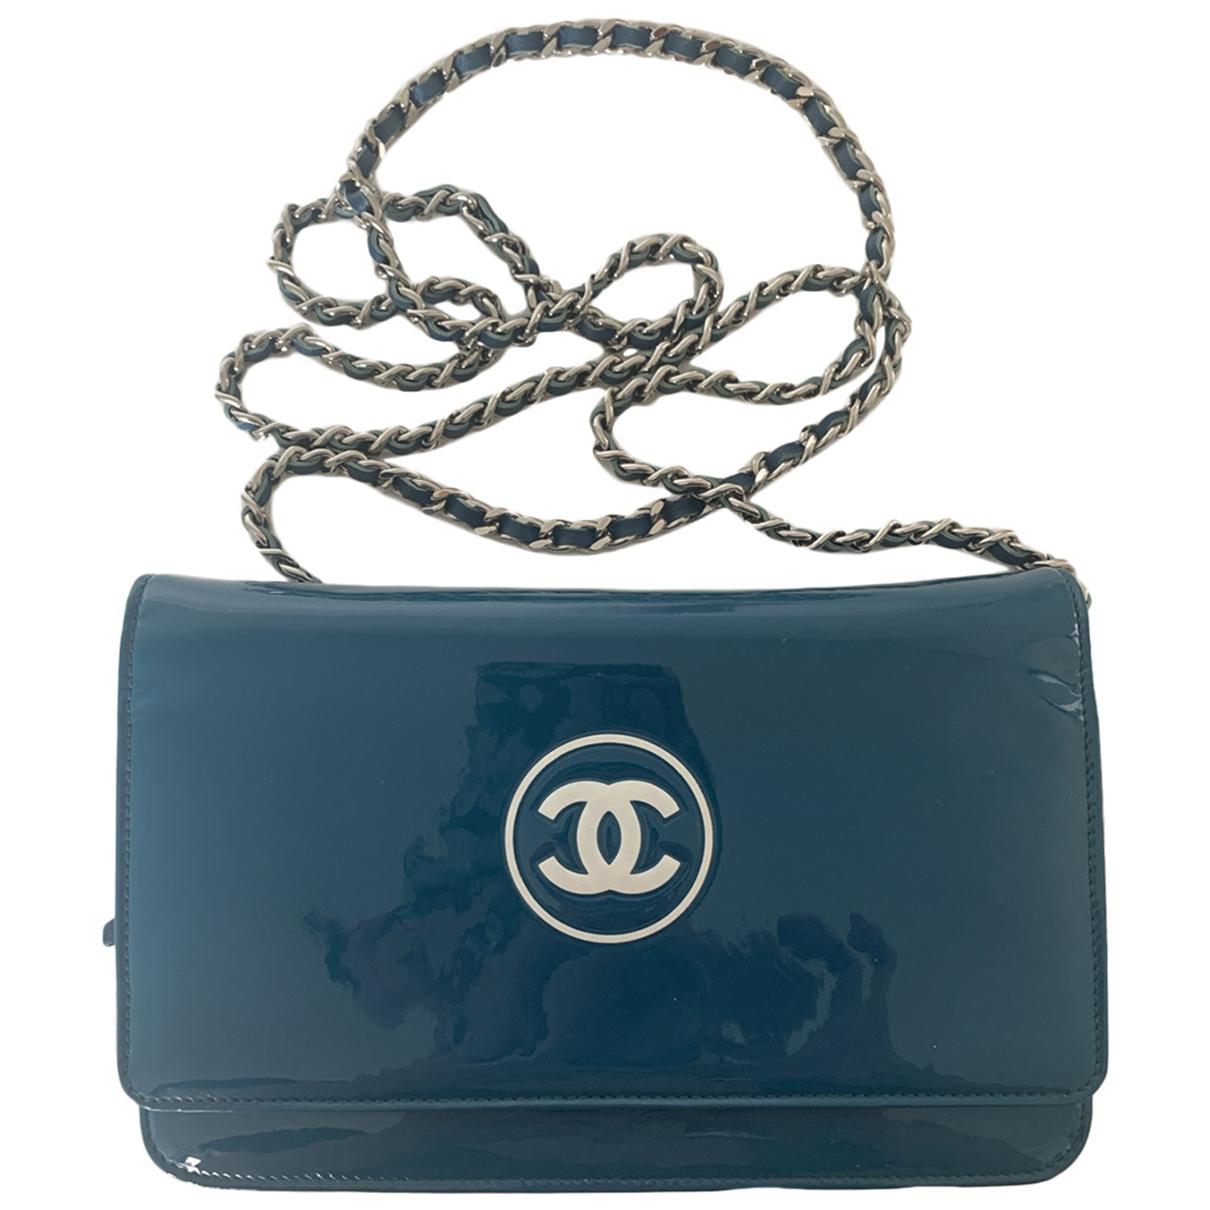 Chanel \N Handtasche in  Blau Lackleder